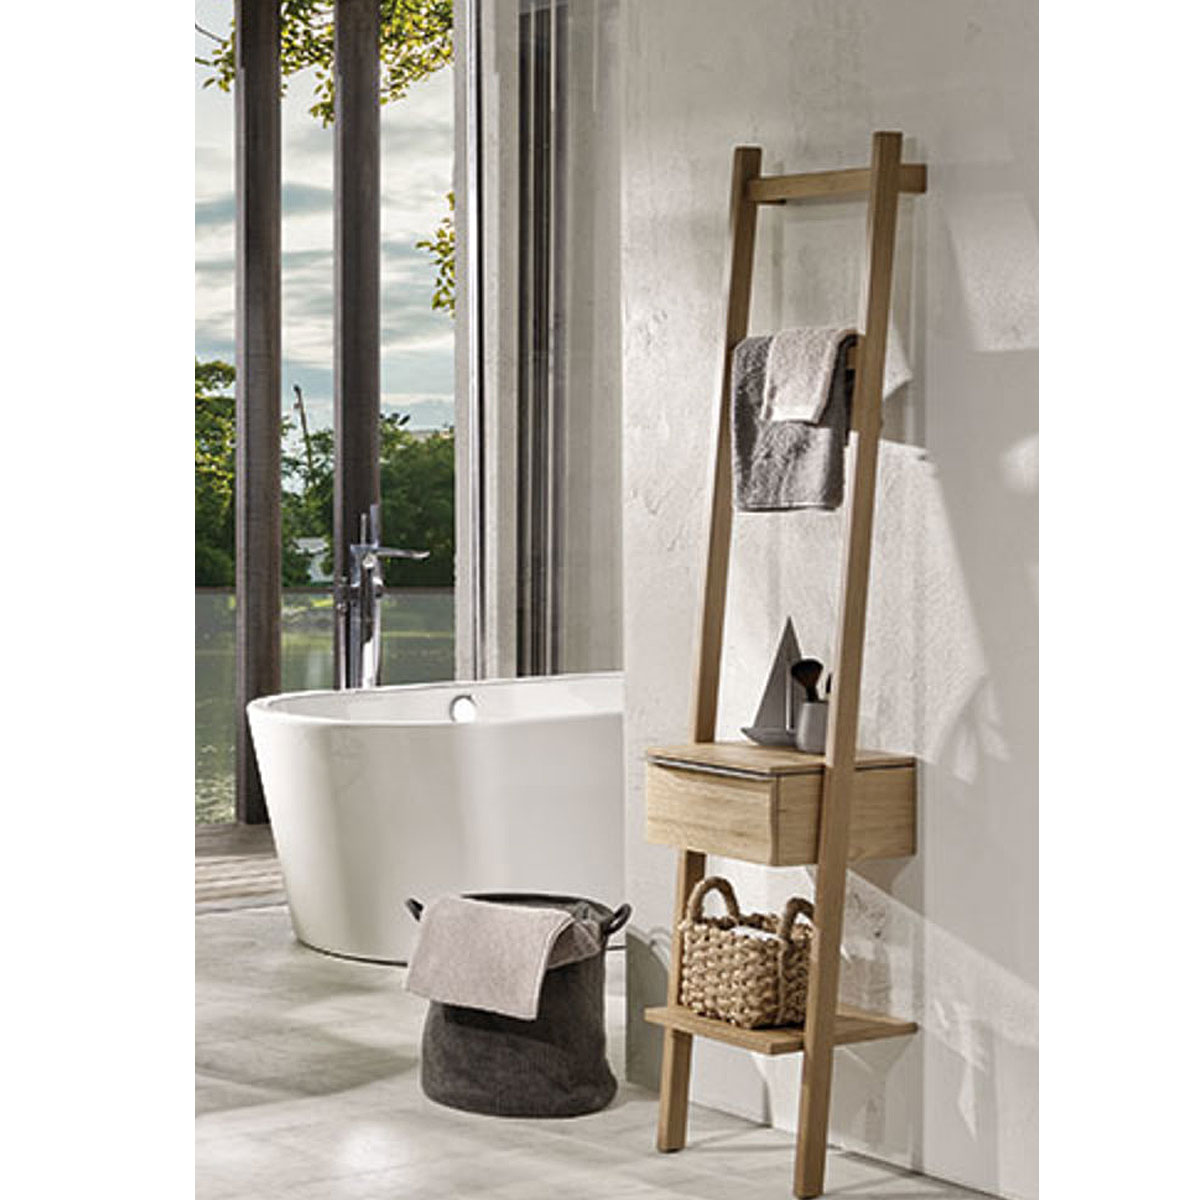 Handtuchhalter Fur Badezimmer